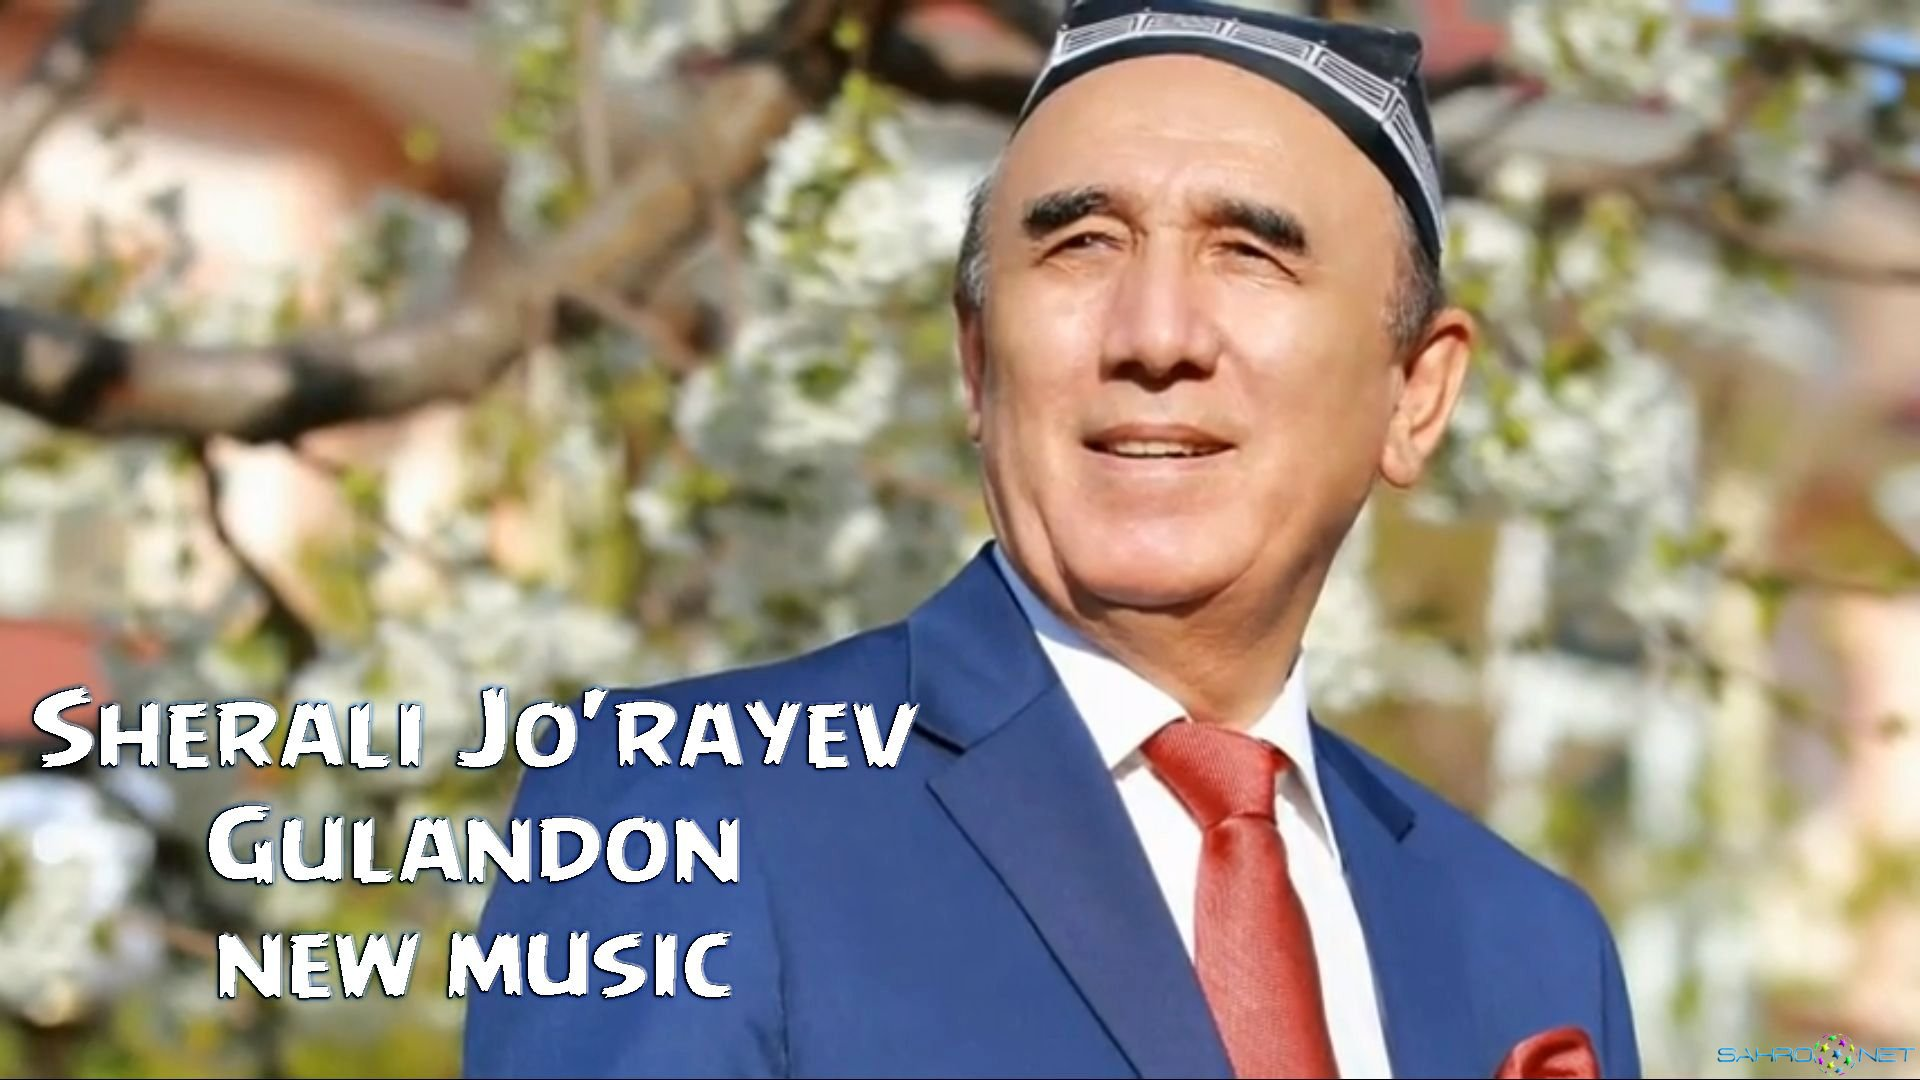 Sherali Jo'rayev 2016 - Gulandon (new music)